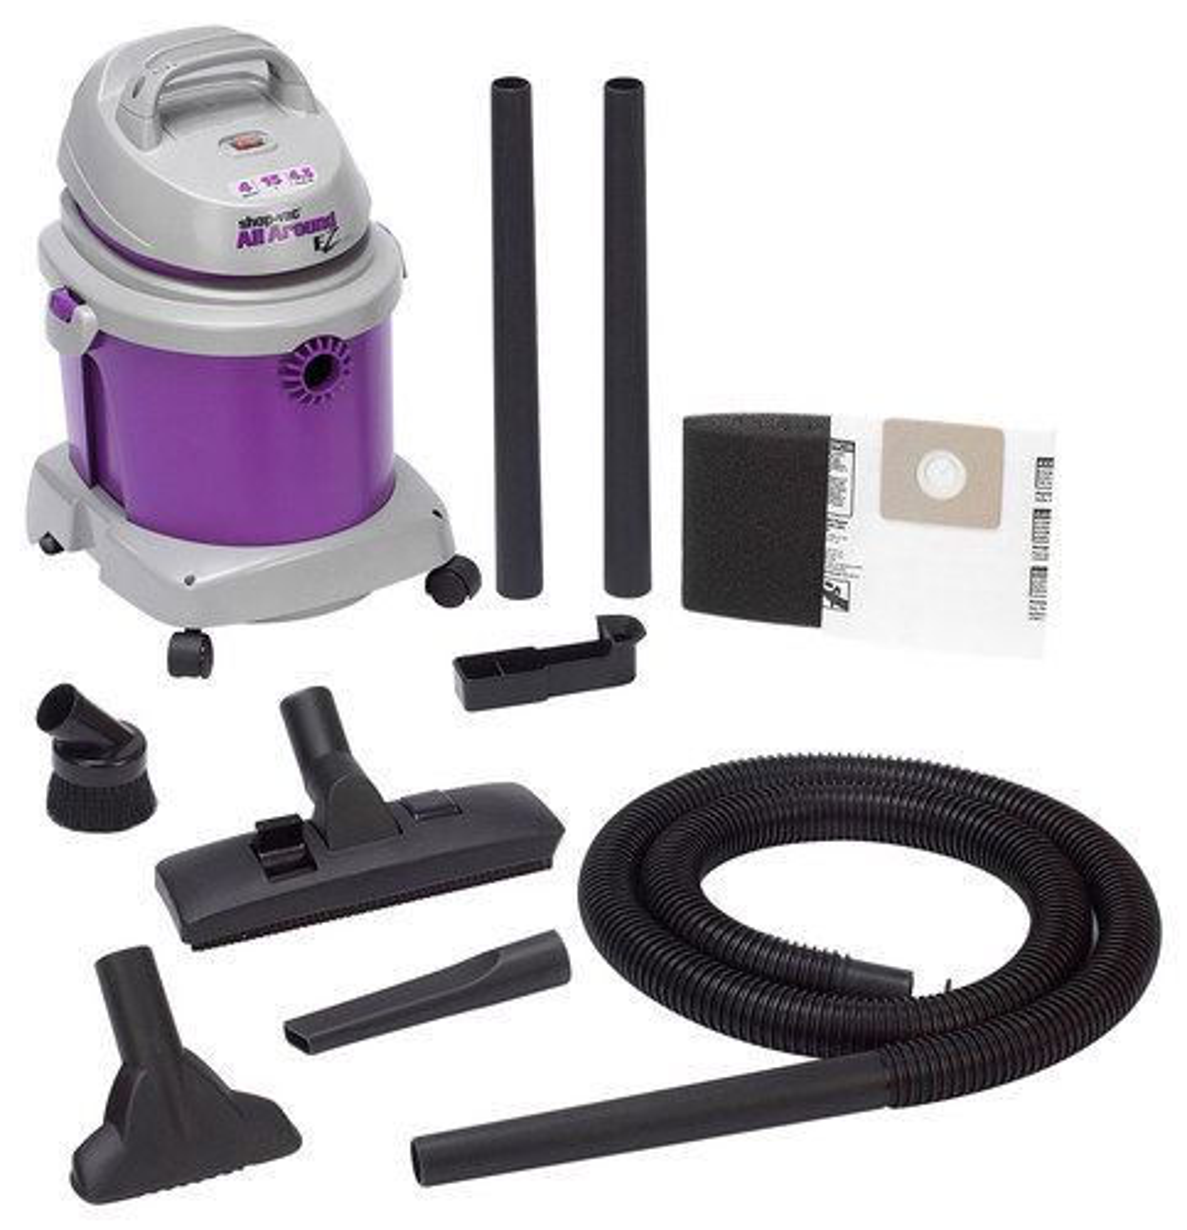 Shop-Vac - All Around 4-Gal. Wet/Dry Vacuum - Purple/Gray